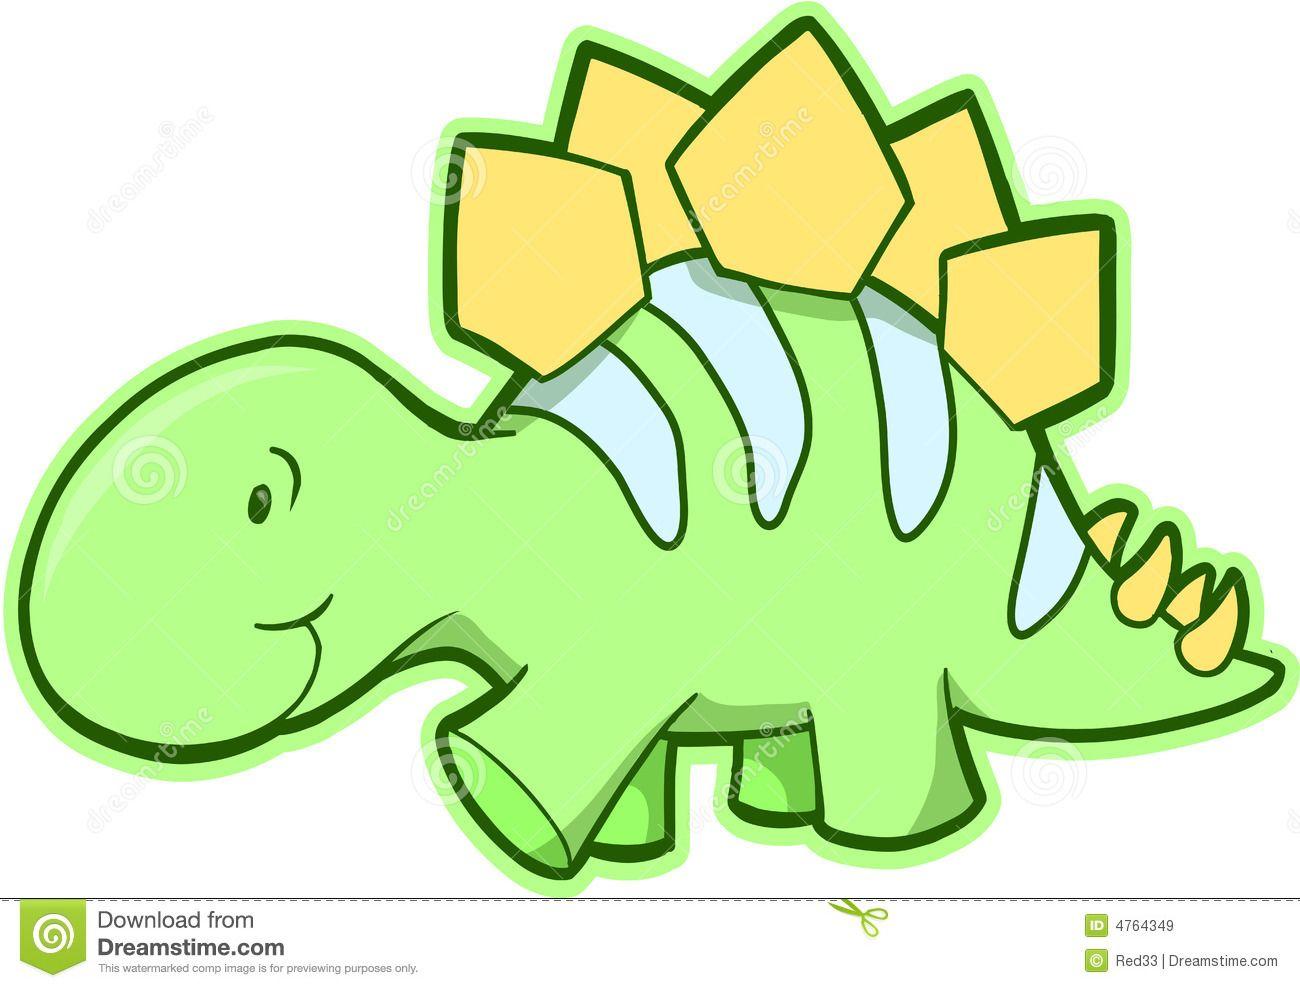 hight resolution of dinossauro cute pesquisa google royalty free photos cute dinosaur free stock image